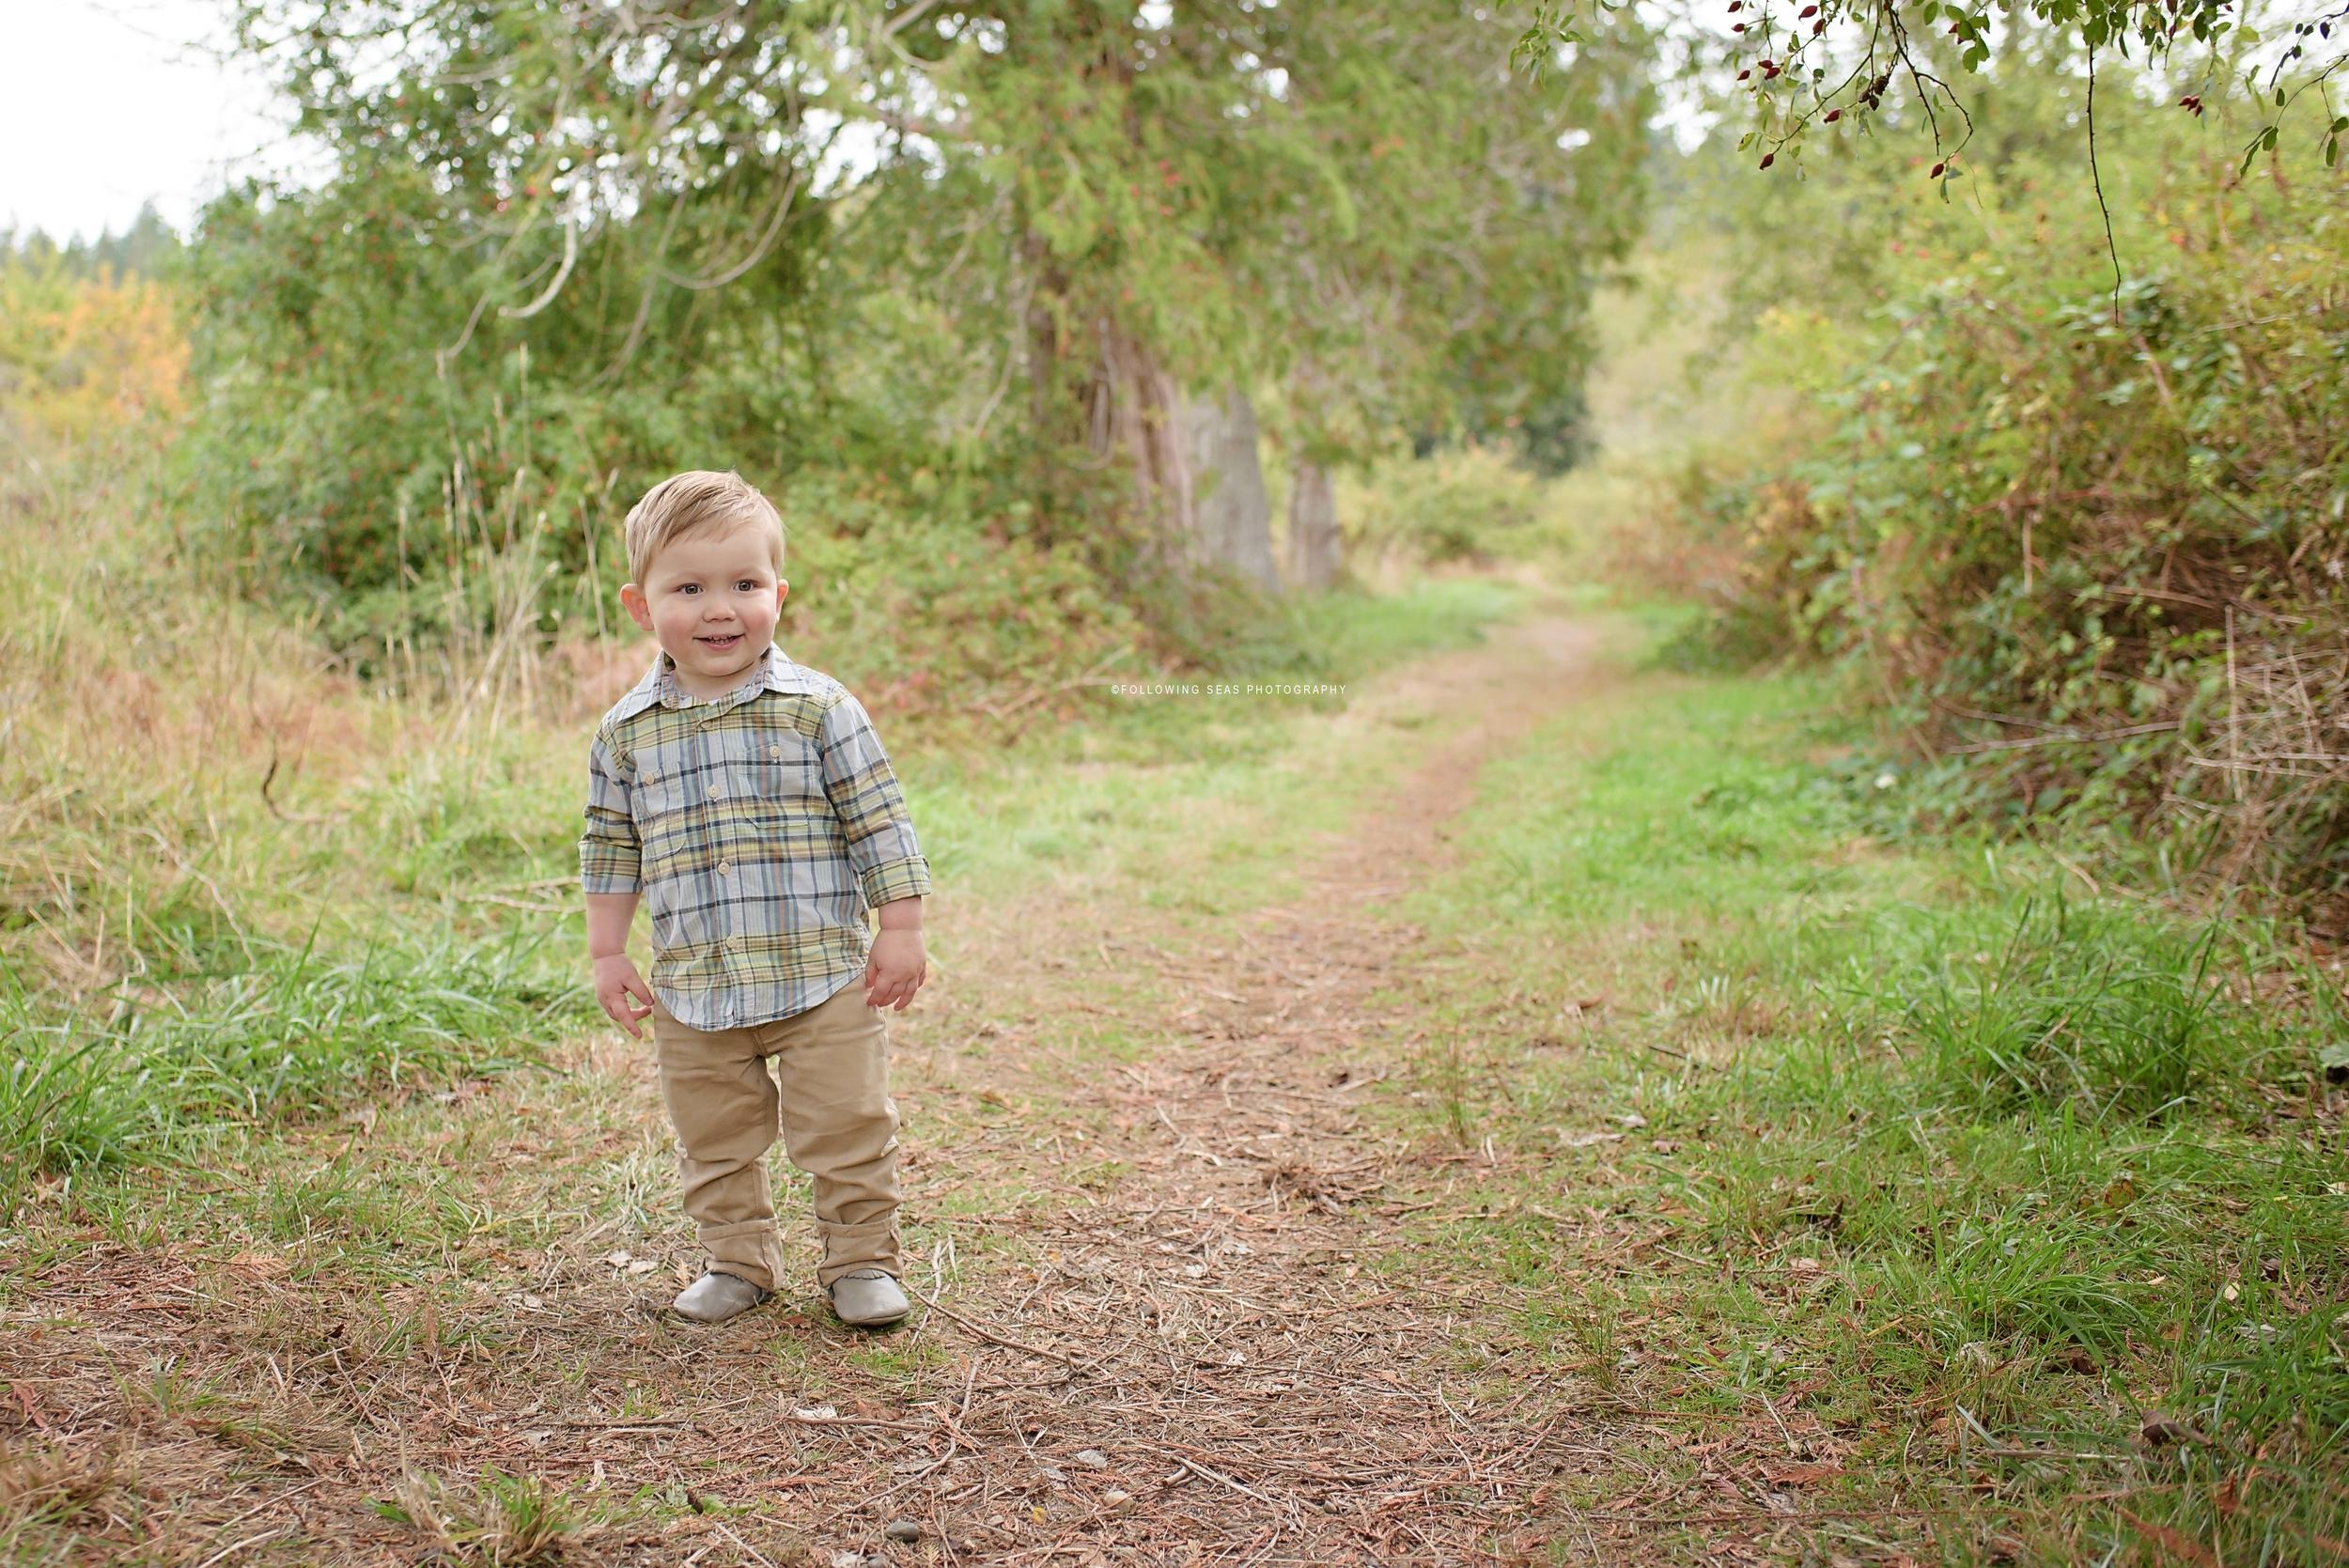 Silverdale-Child-Photographer-Following-Seas-Photography-8072 copy.jpg